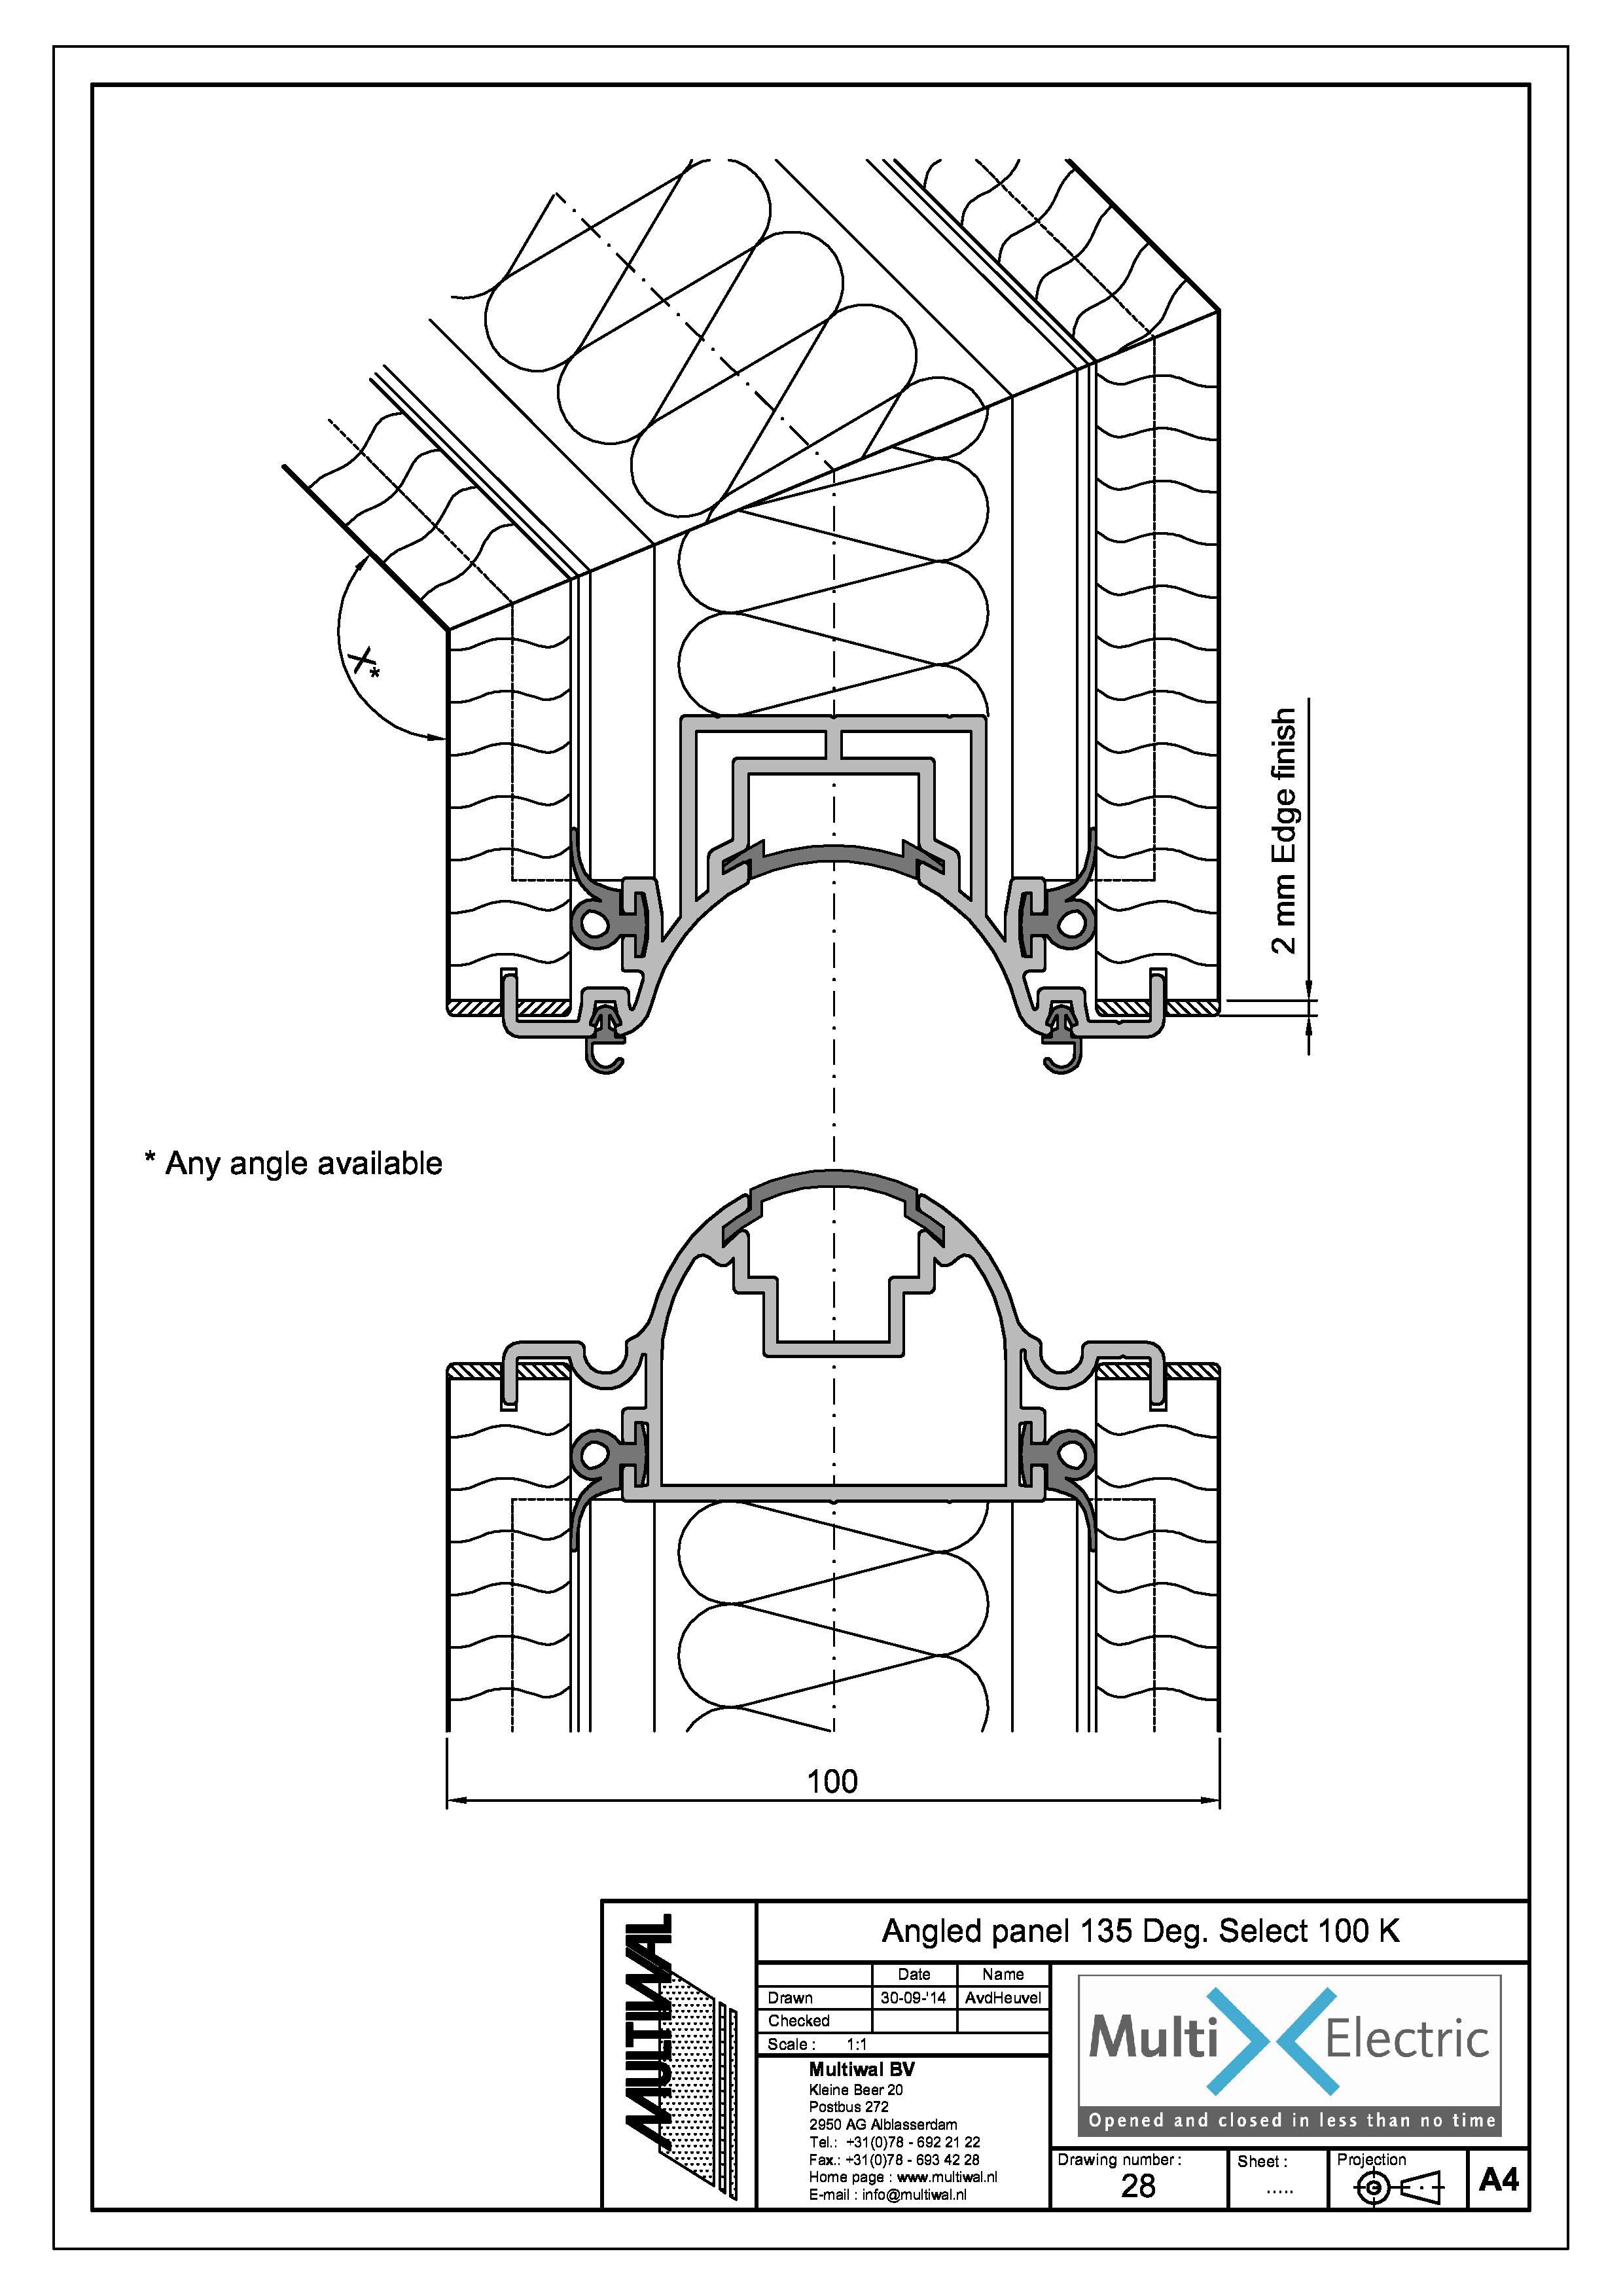 control panel wiring diagram numbering